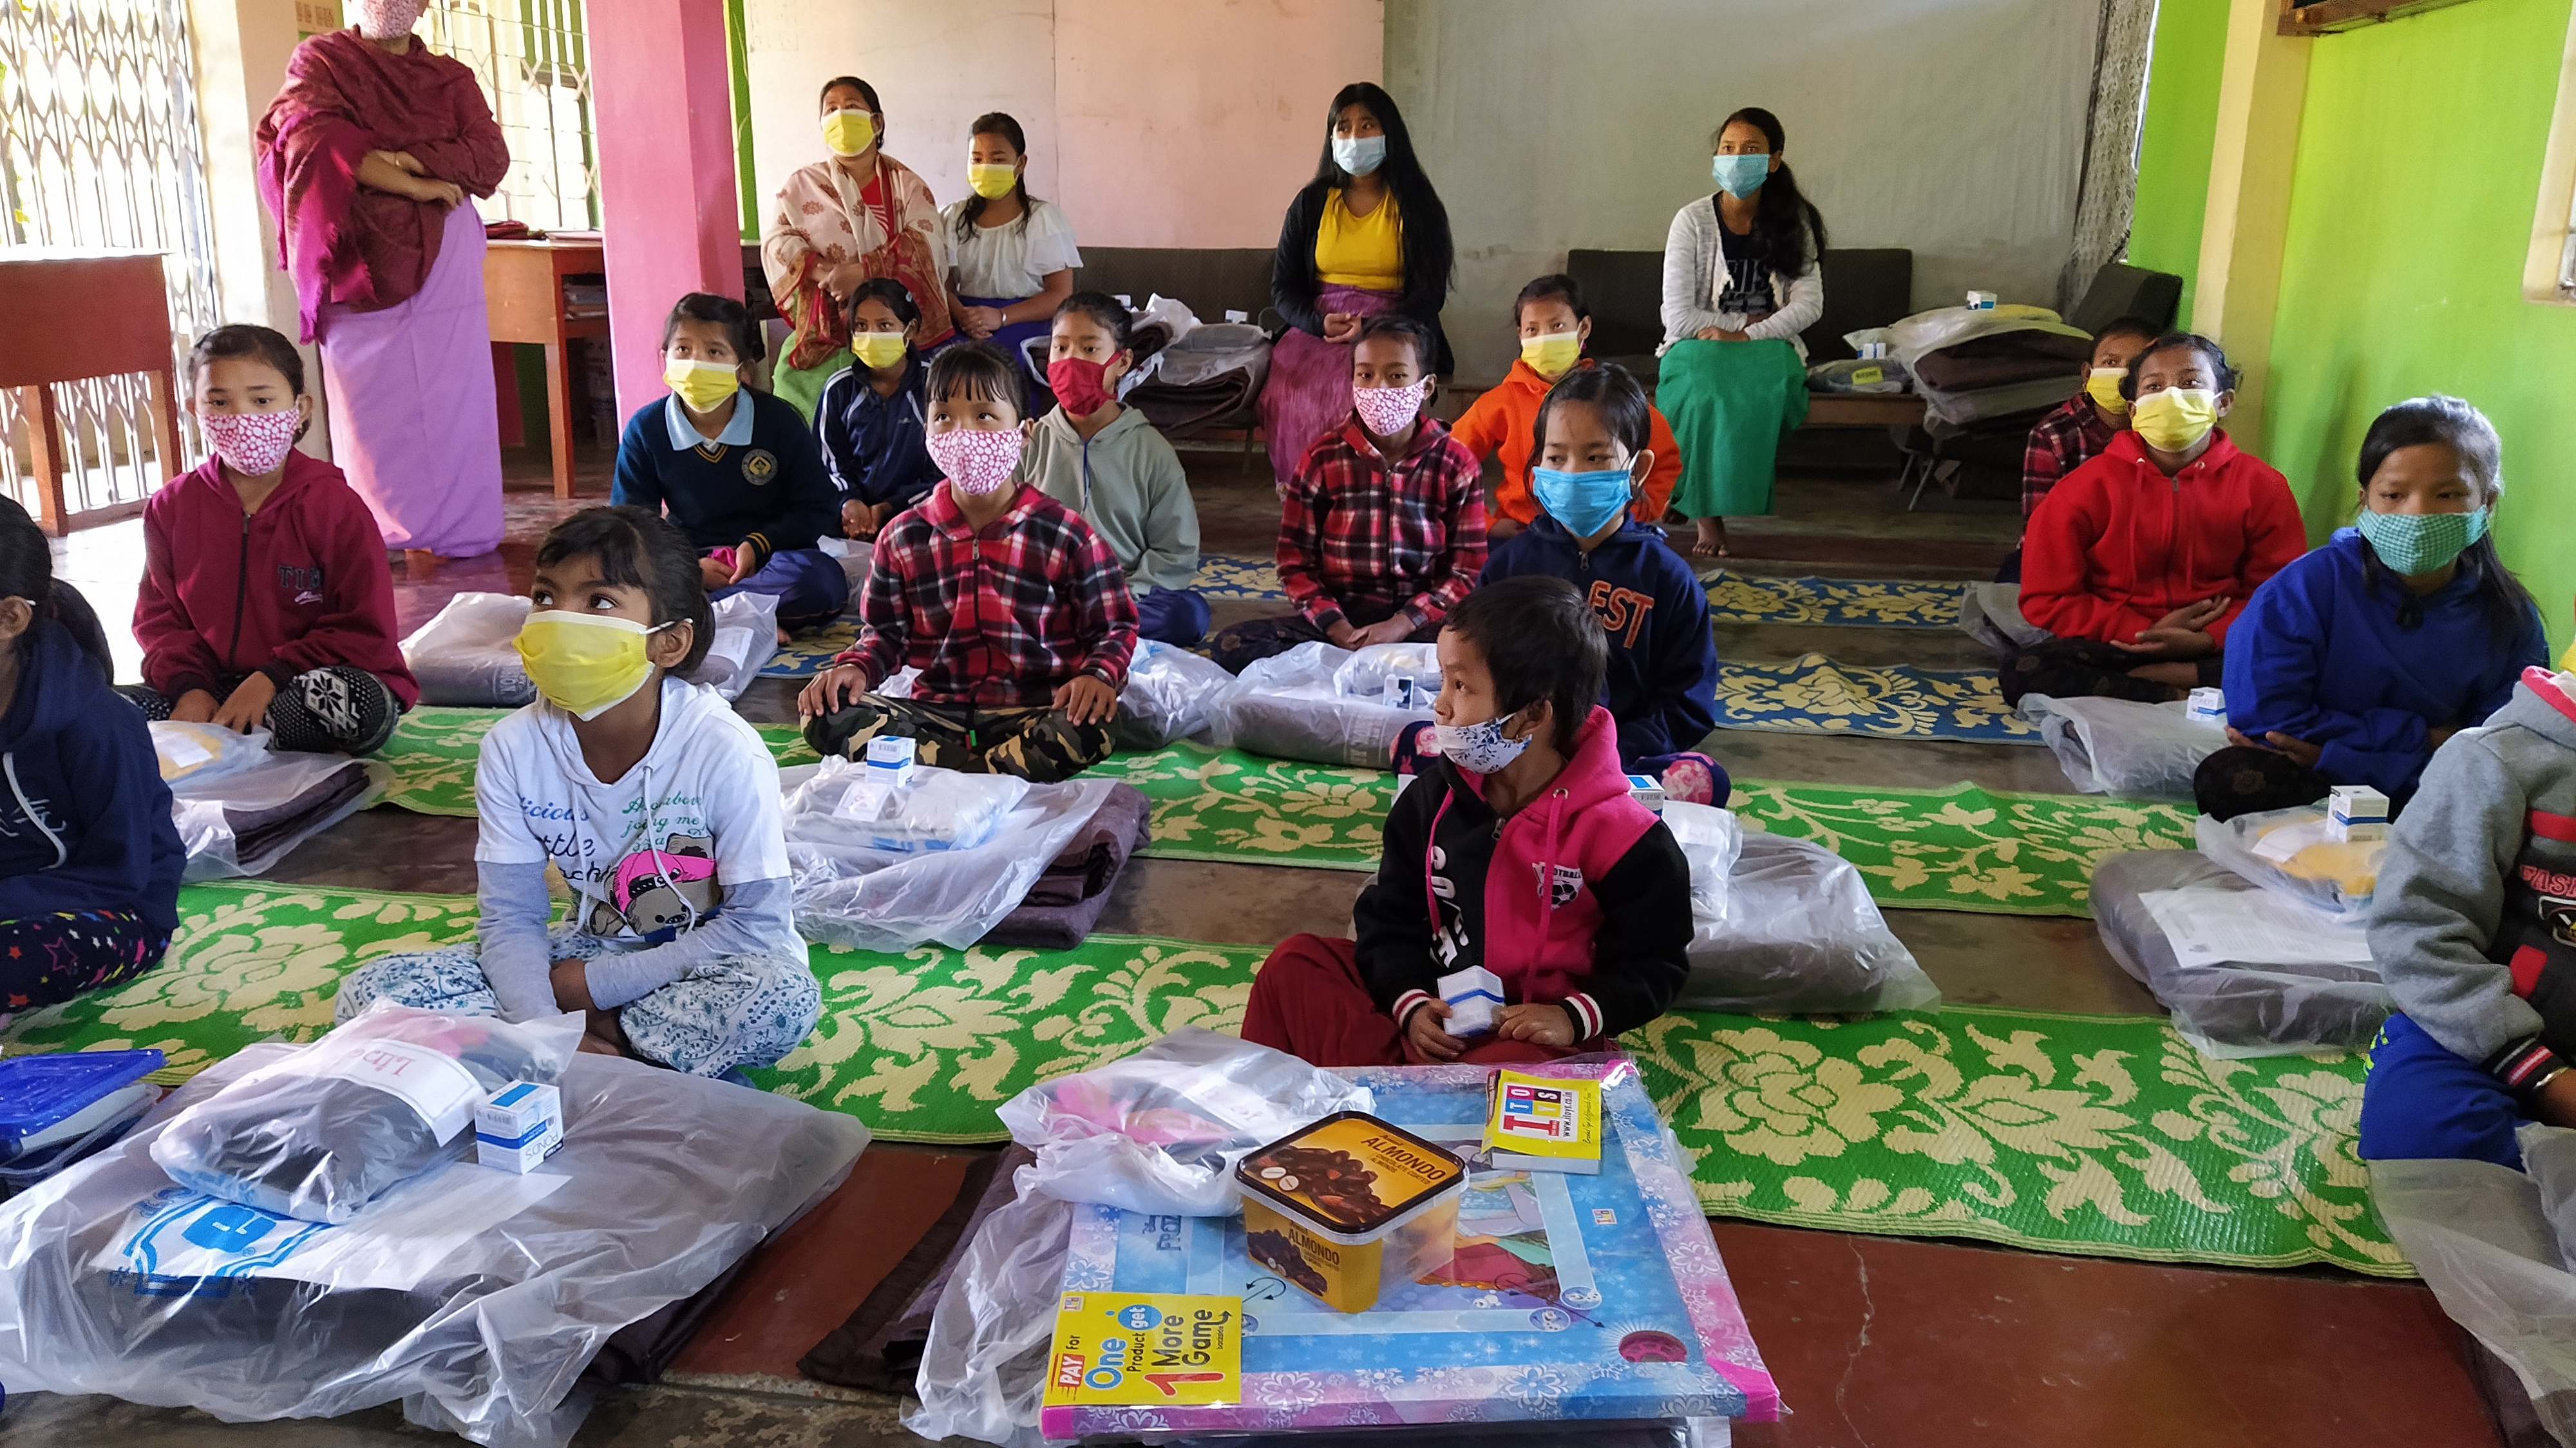 Poirei Nawakon Winter Relief 25.11.2020 (14)